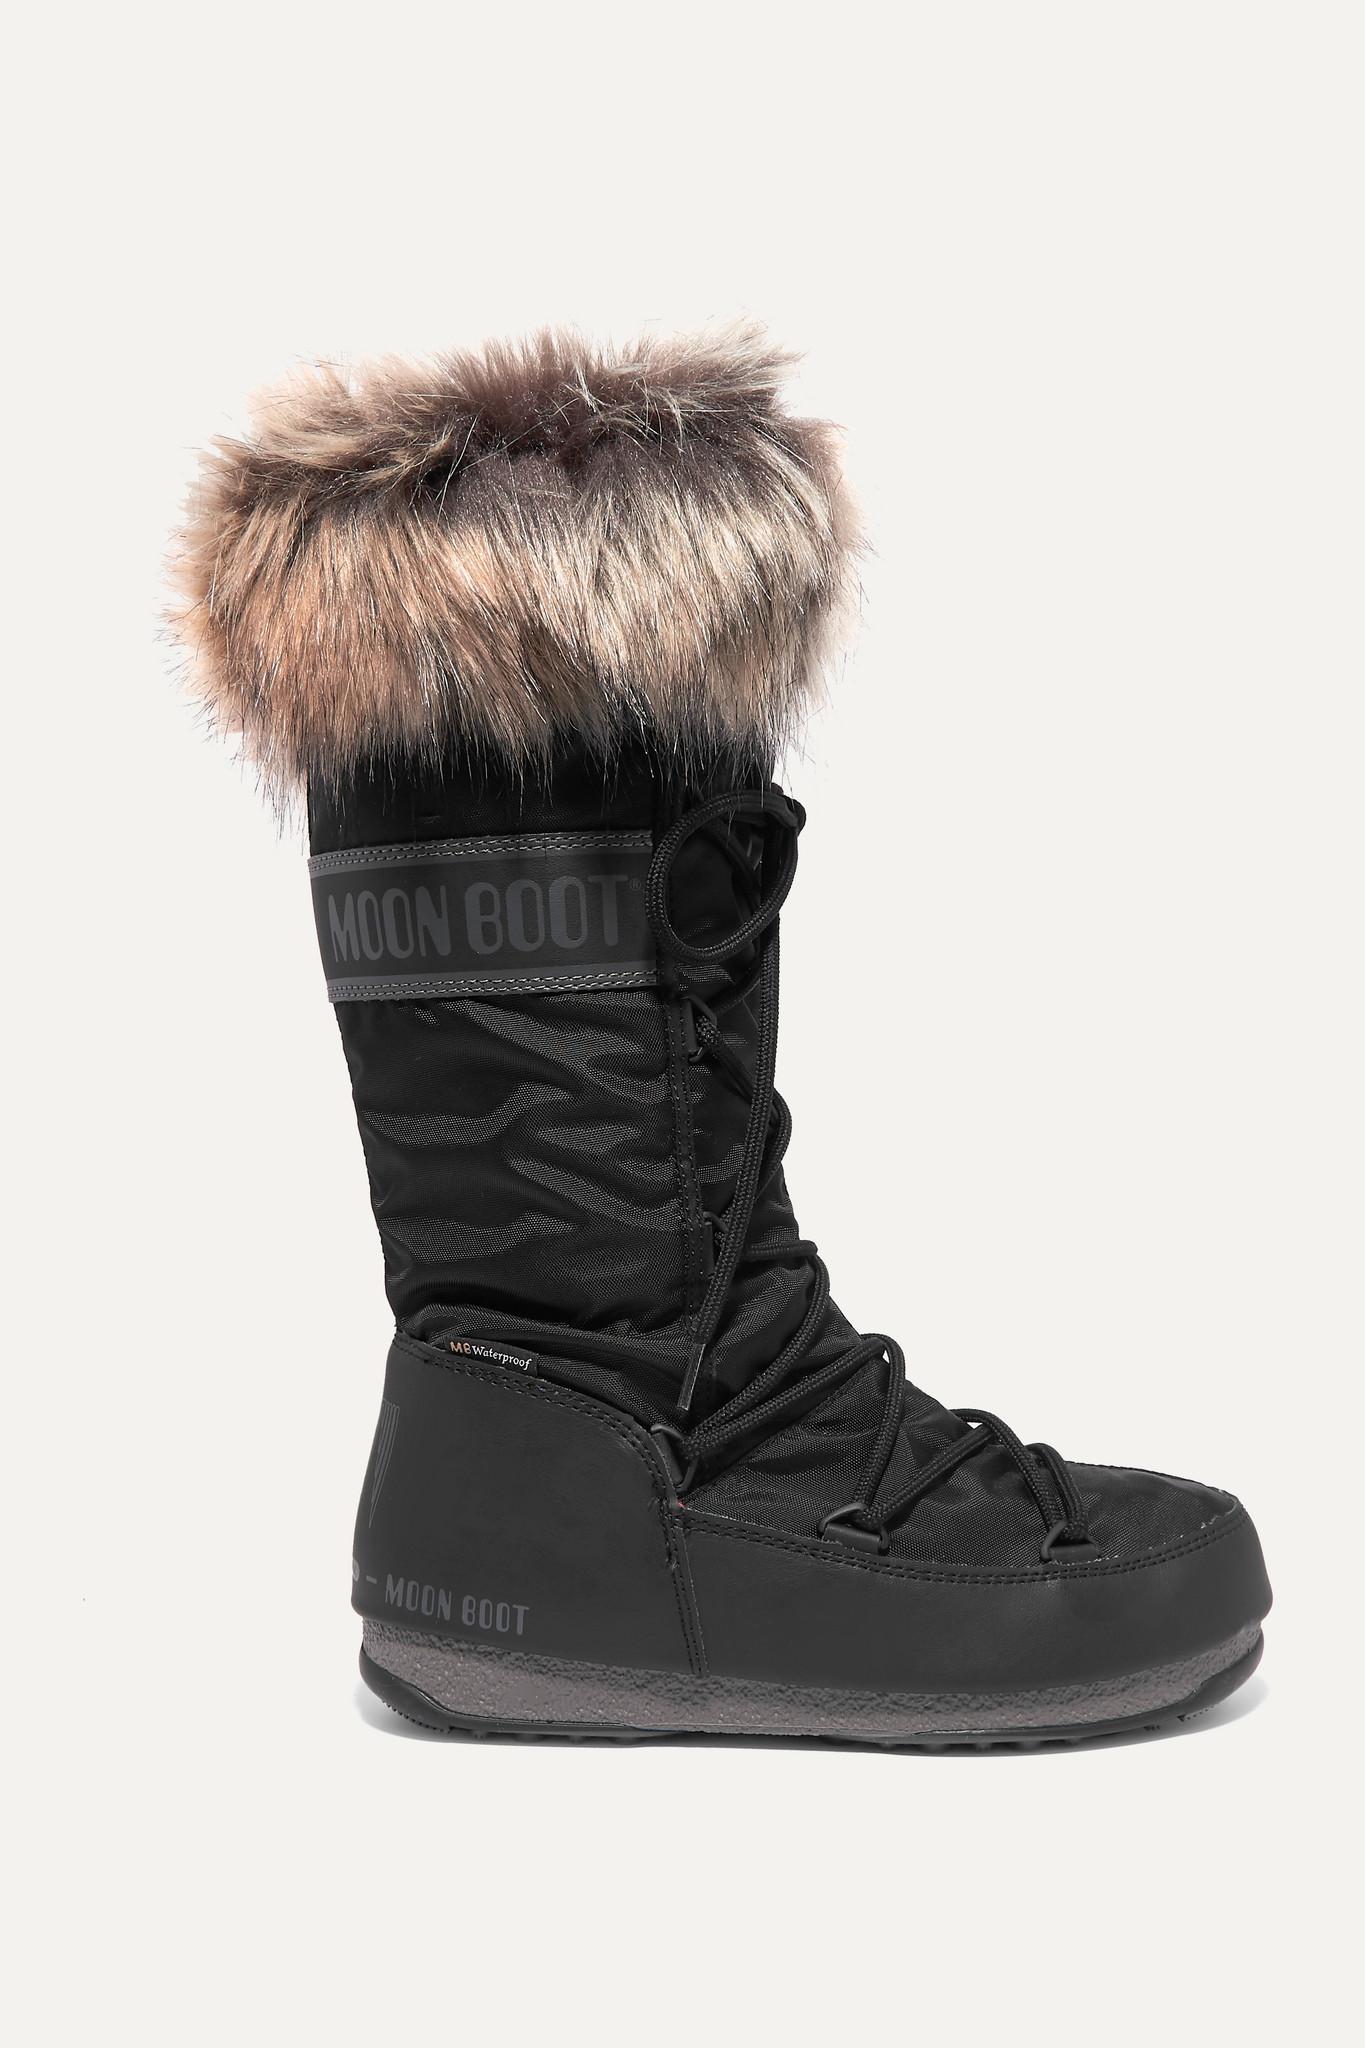 MOON BOOT - Monaco 人造皮草边饰软壳面料雪地靴 - 黑色 - IT38